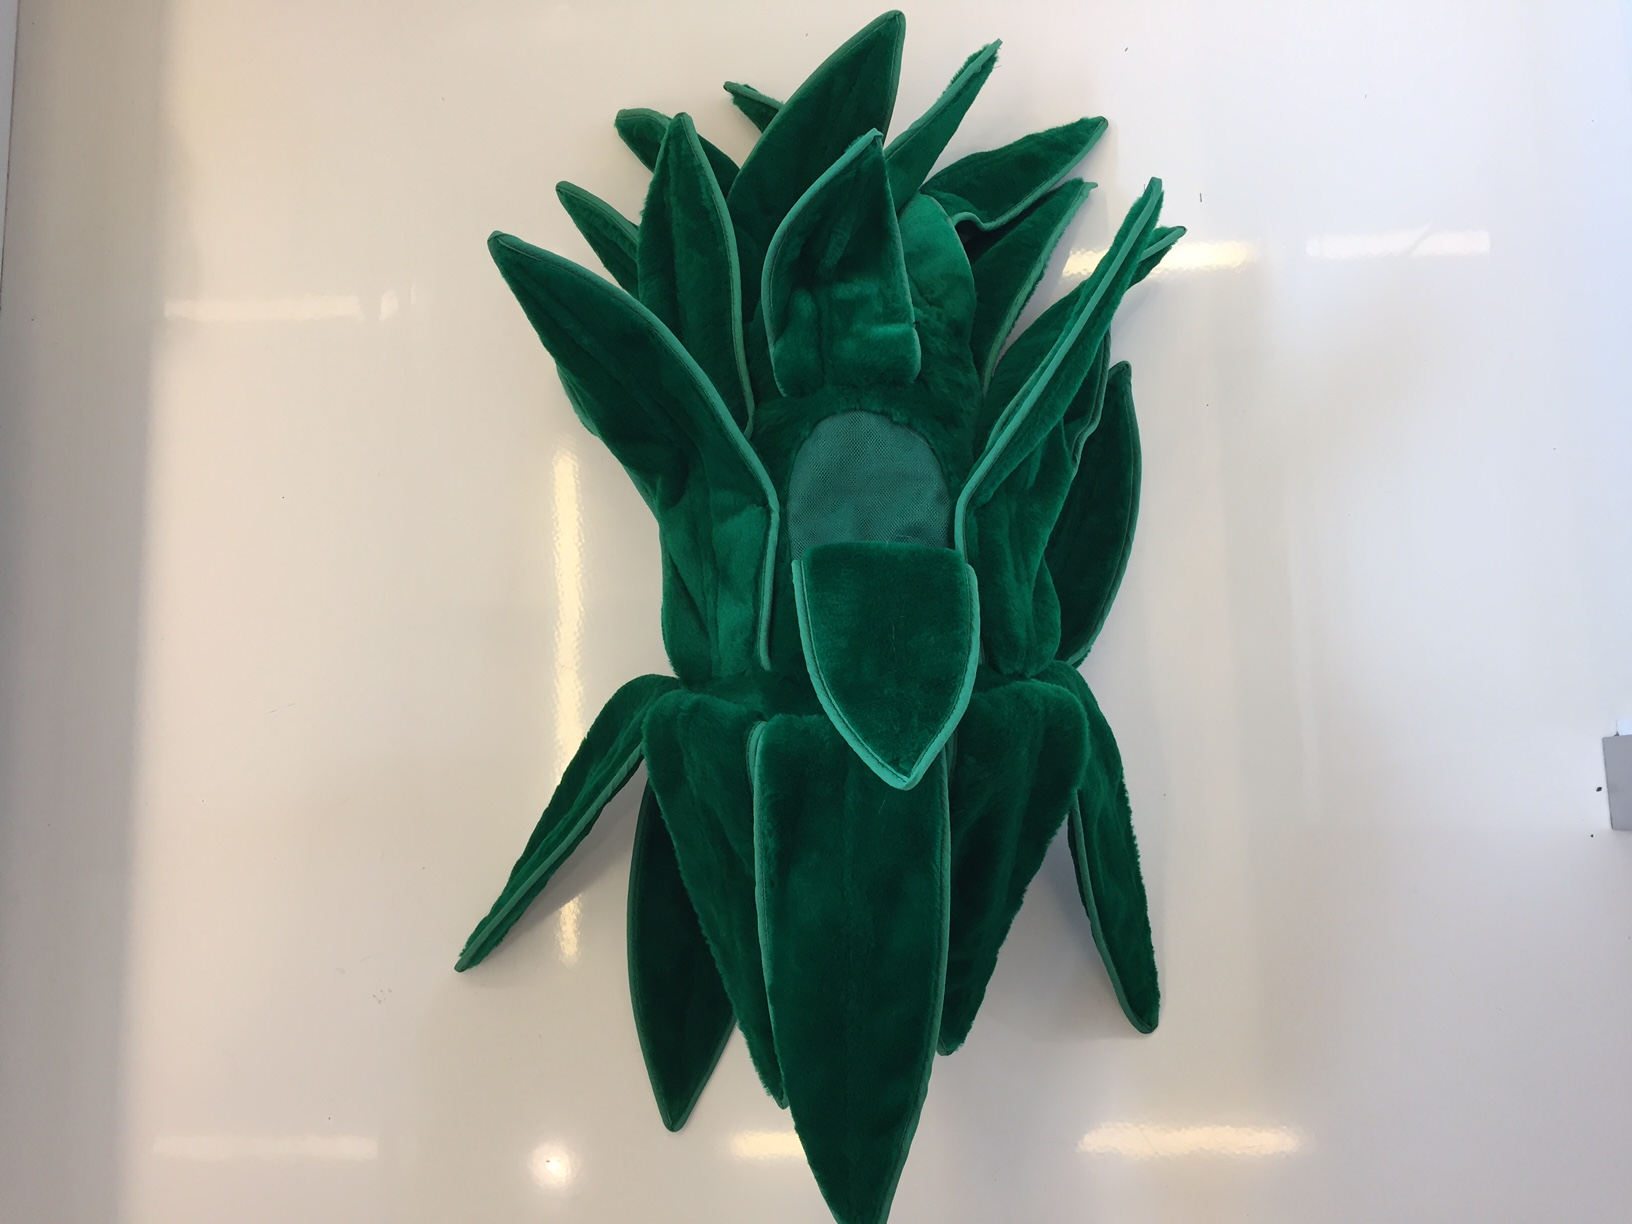 ananas kostuem maskottchen kost m herstellung individuell oder aus einem kost mshop promotion. Black Bedroom Furniture Sets. Home Design Ideas